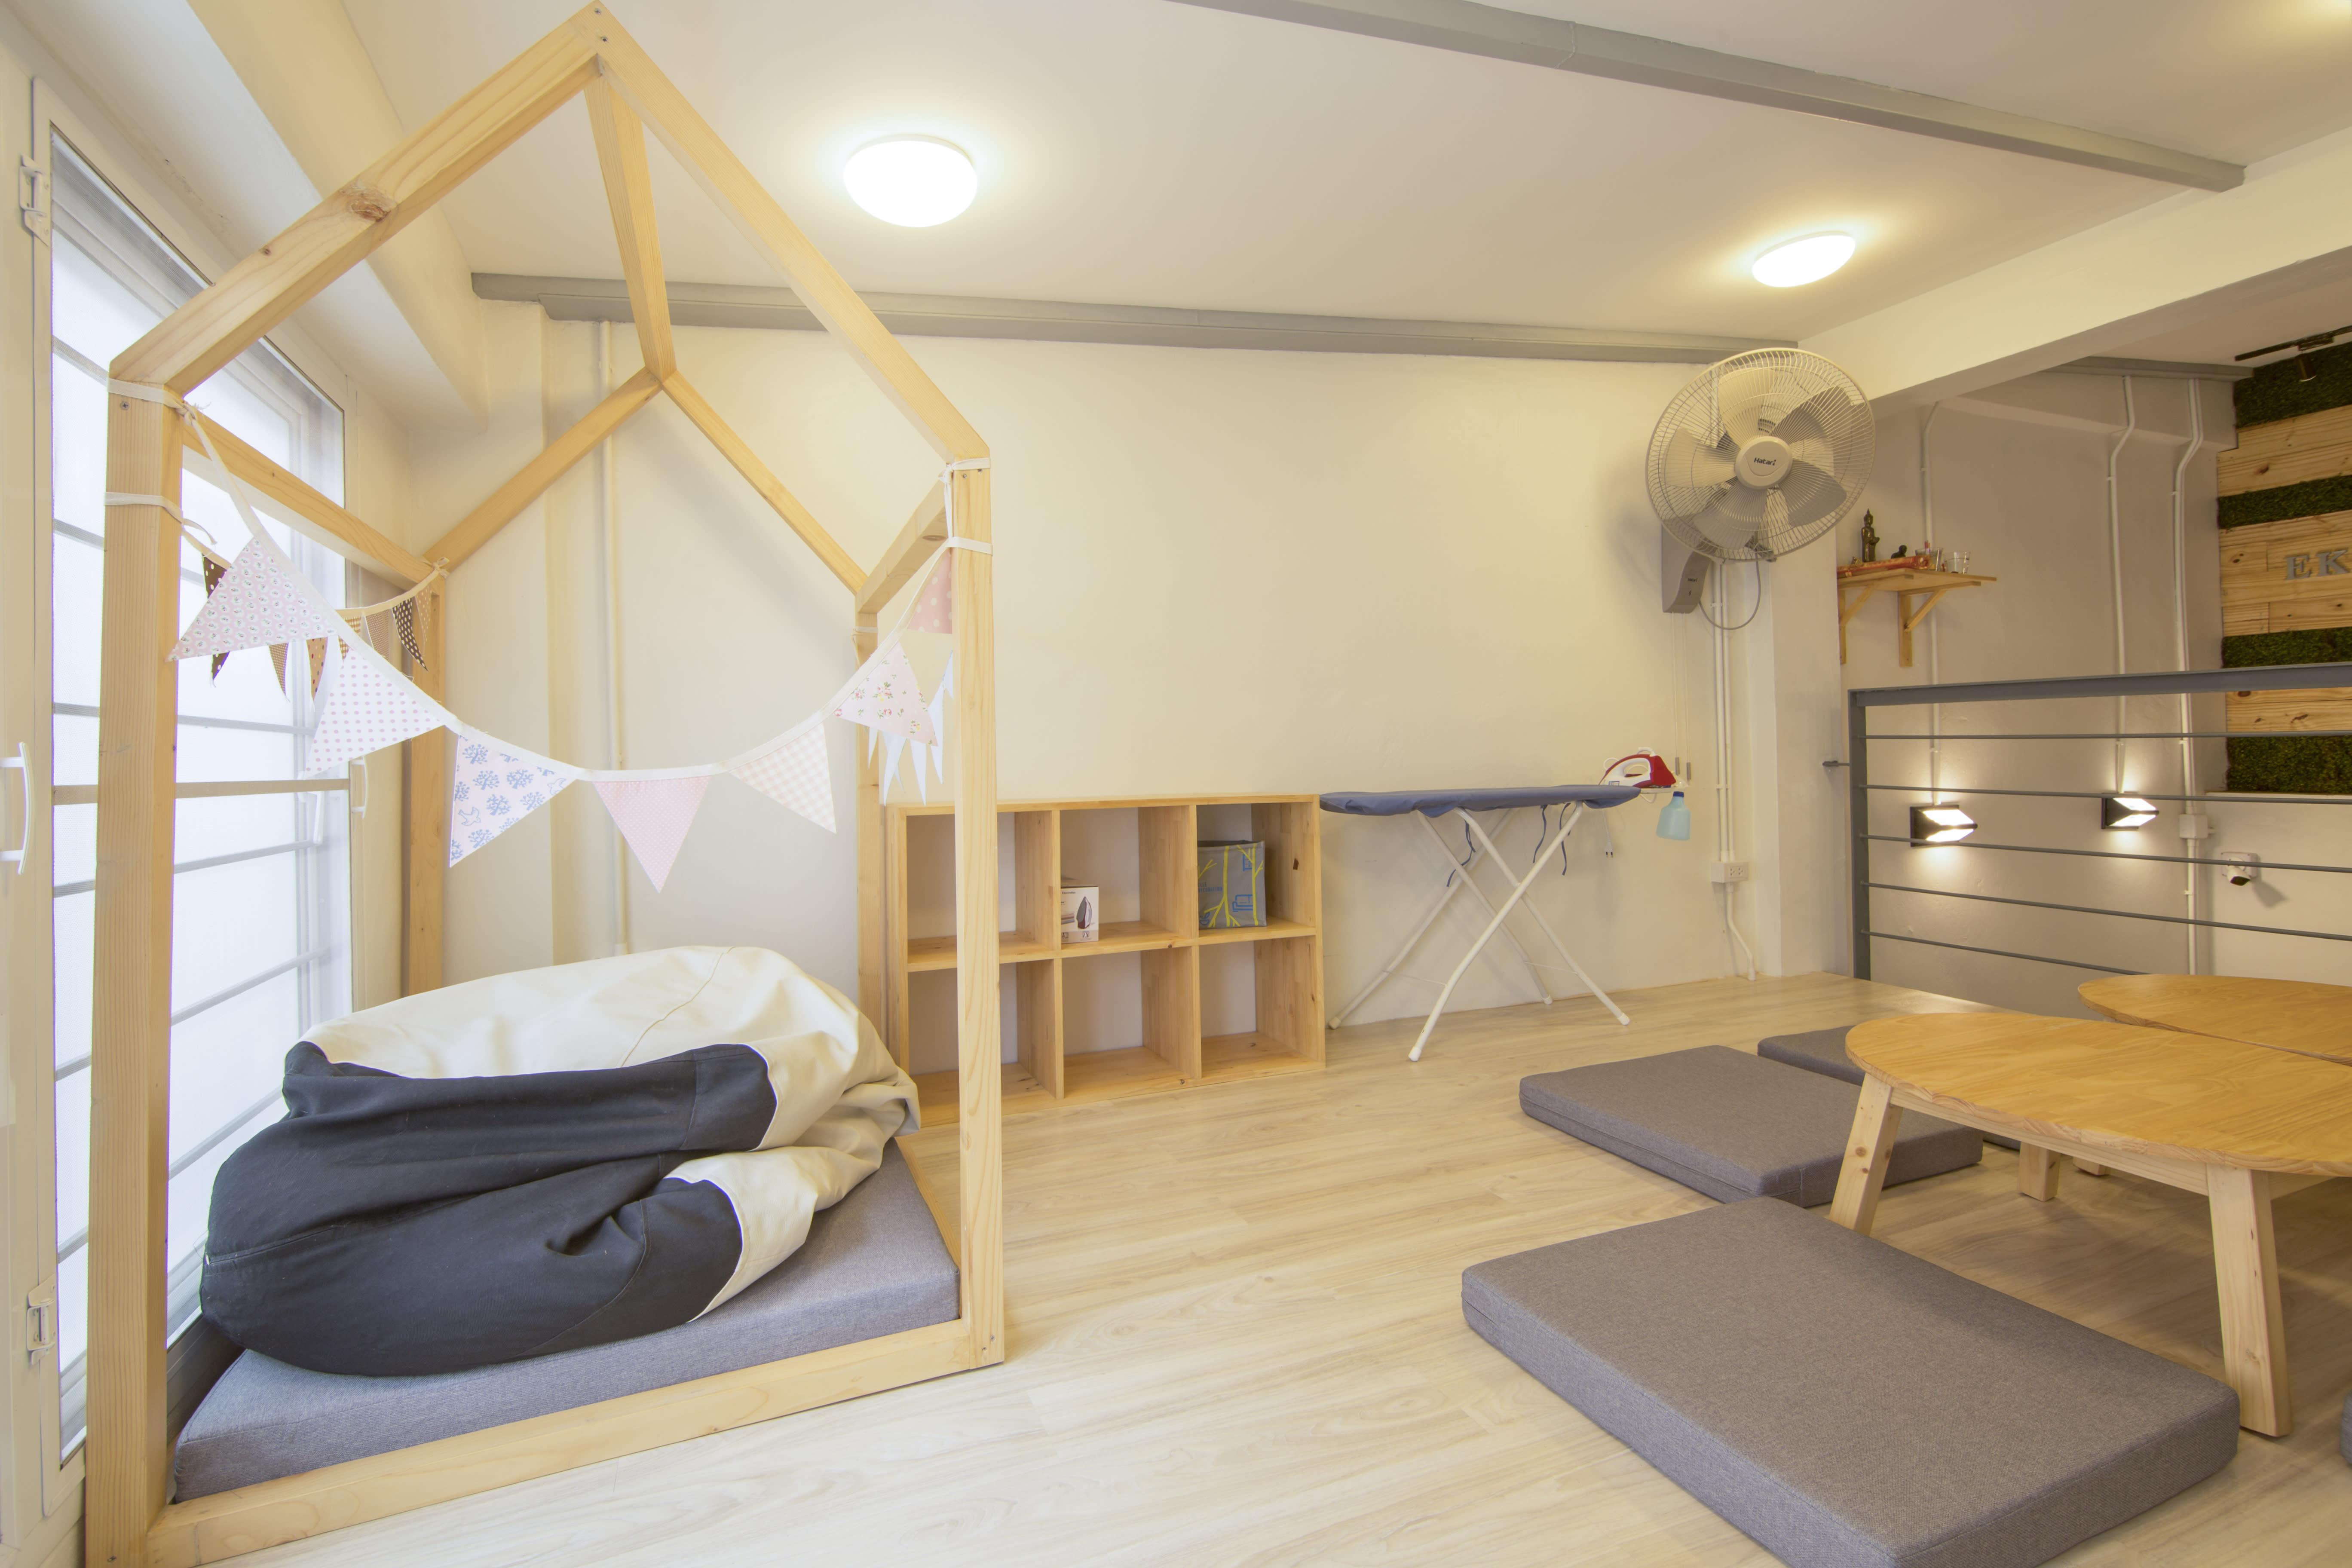 HOSTEL - Ekanake Hostel